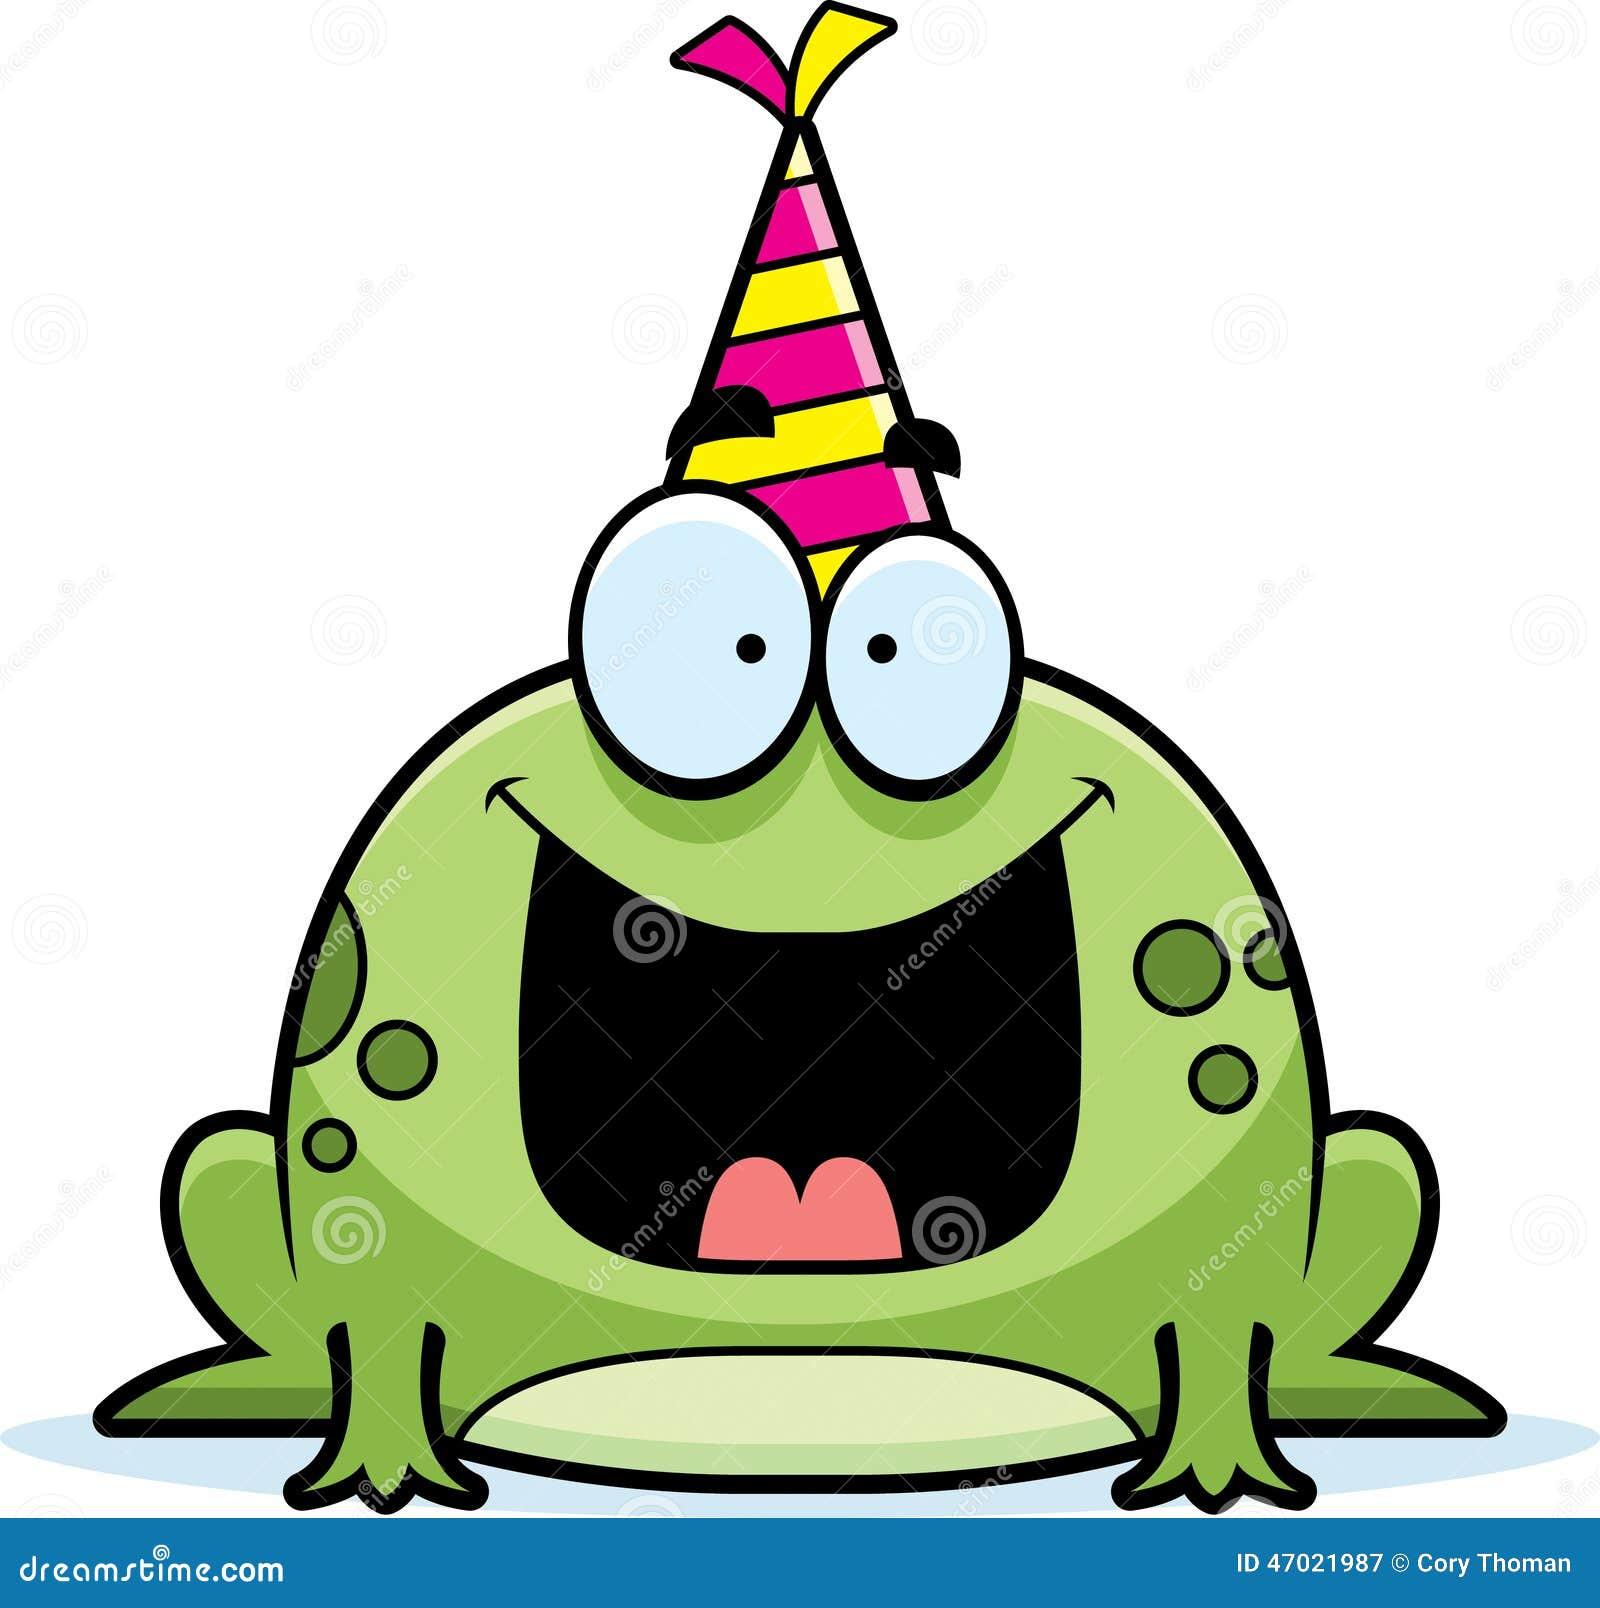 Cartoon Frog Birthday Party Stock Vector Image 47021987